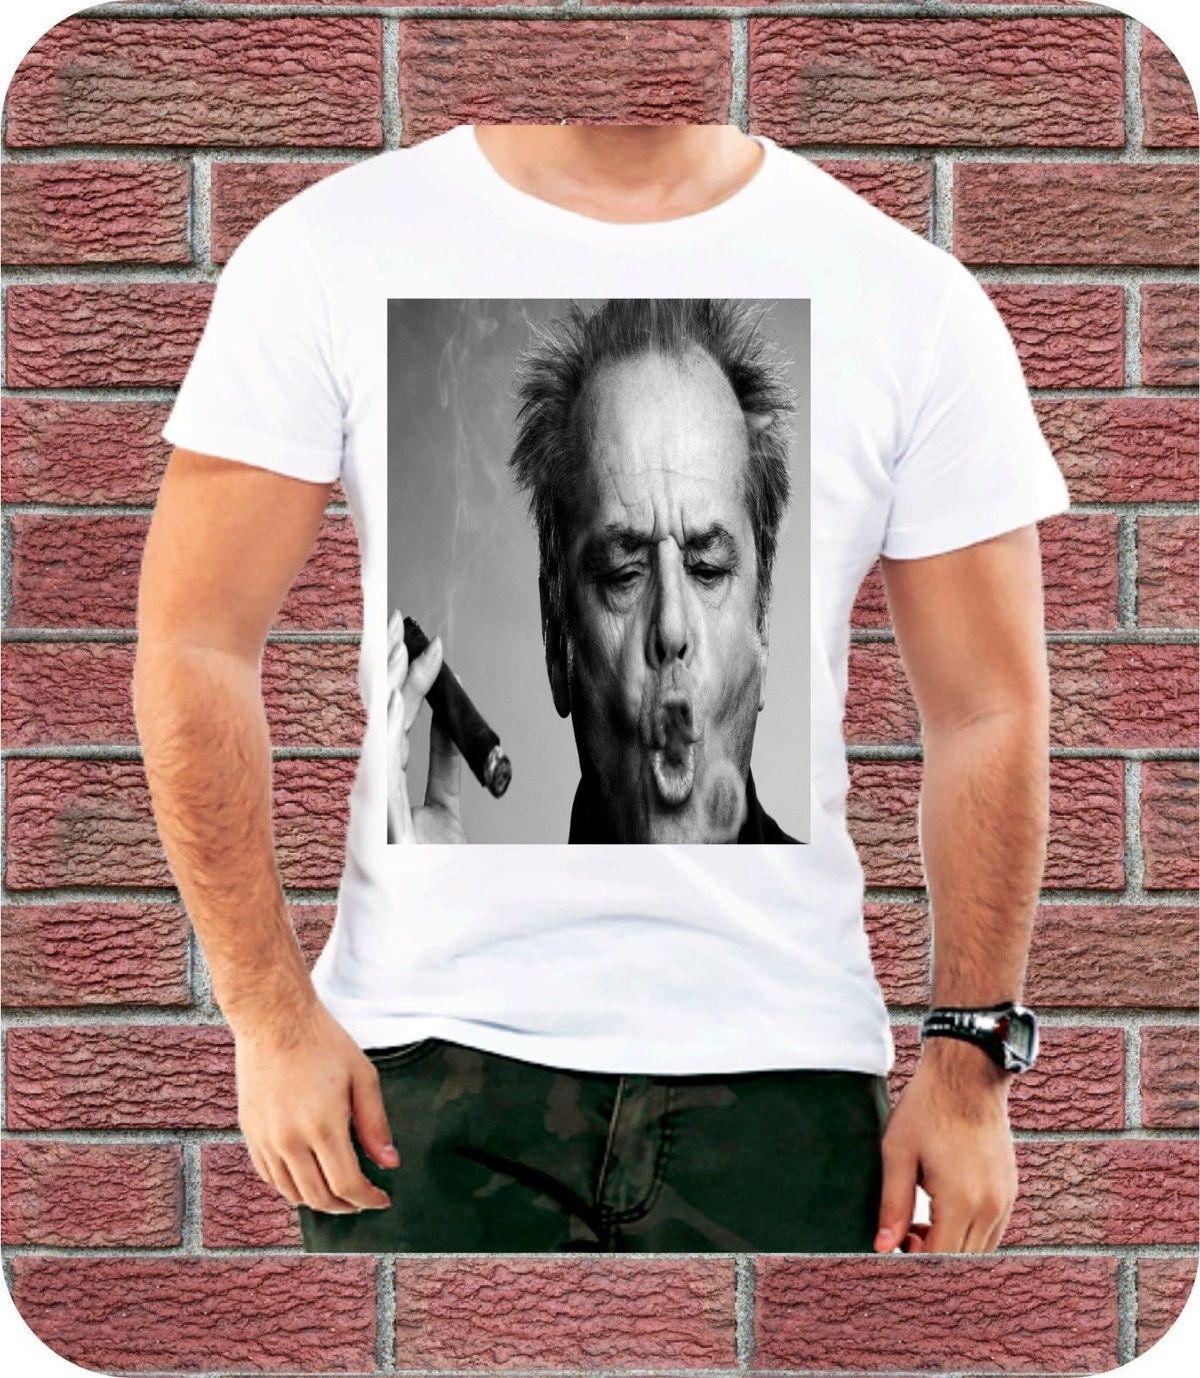 Jack Nicholson Cigar Men T Shirt St Jude Birthday Christmas Present ...